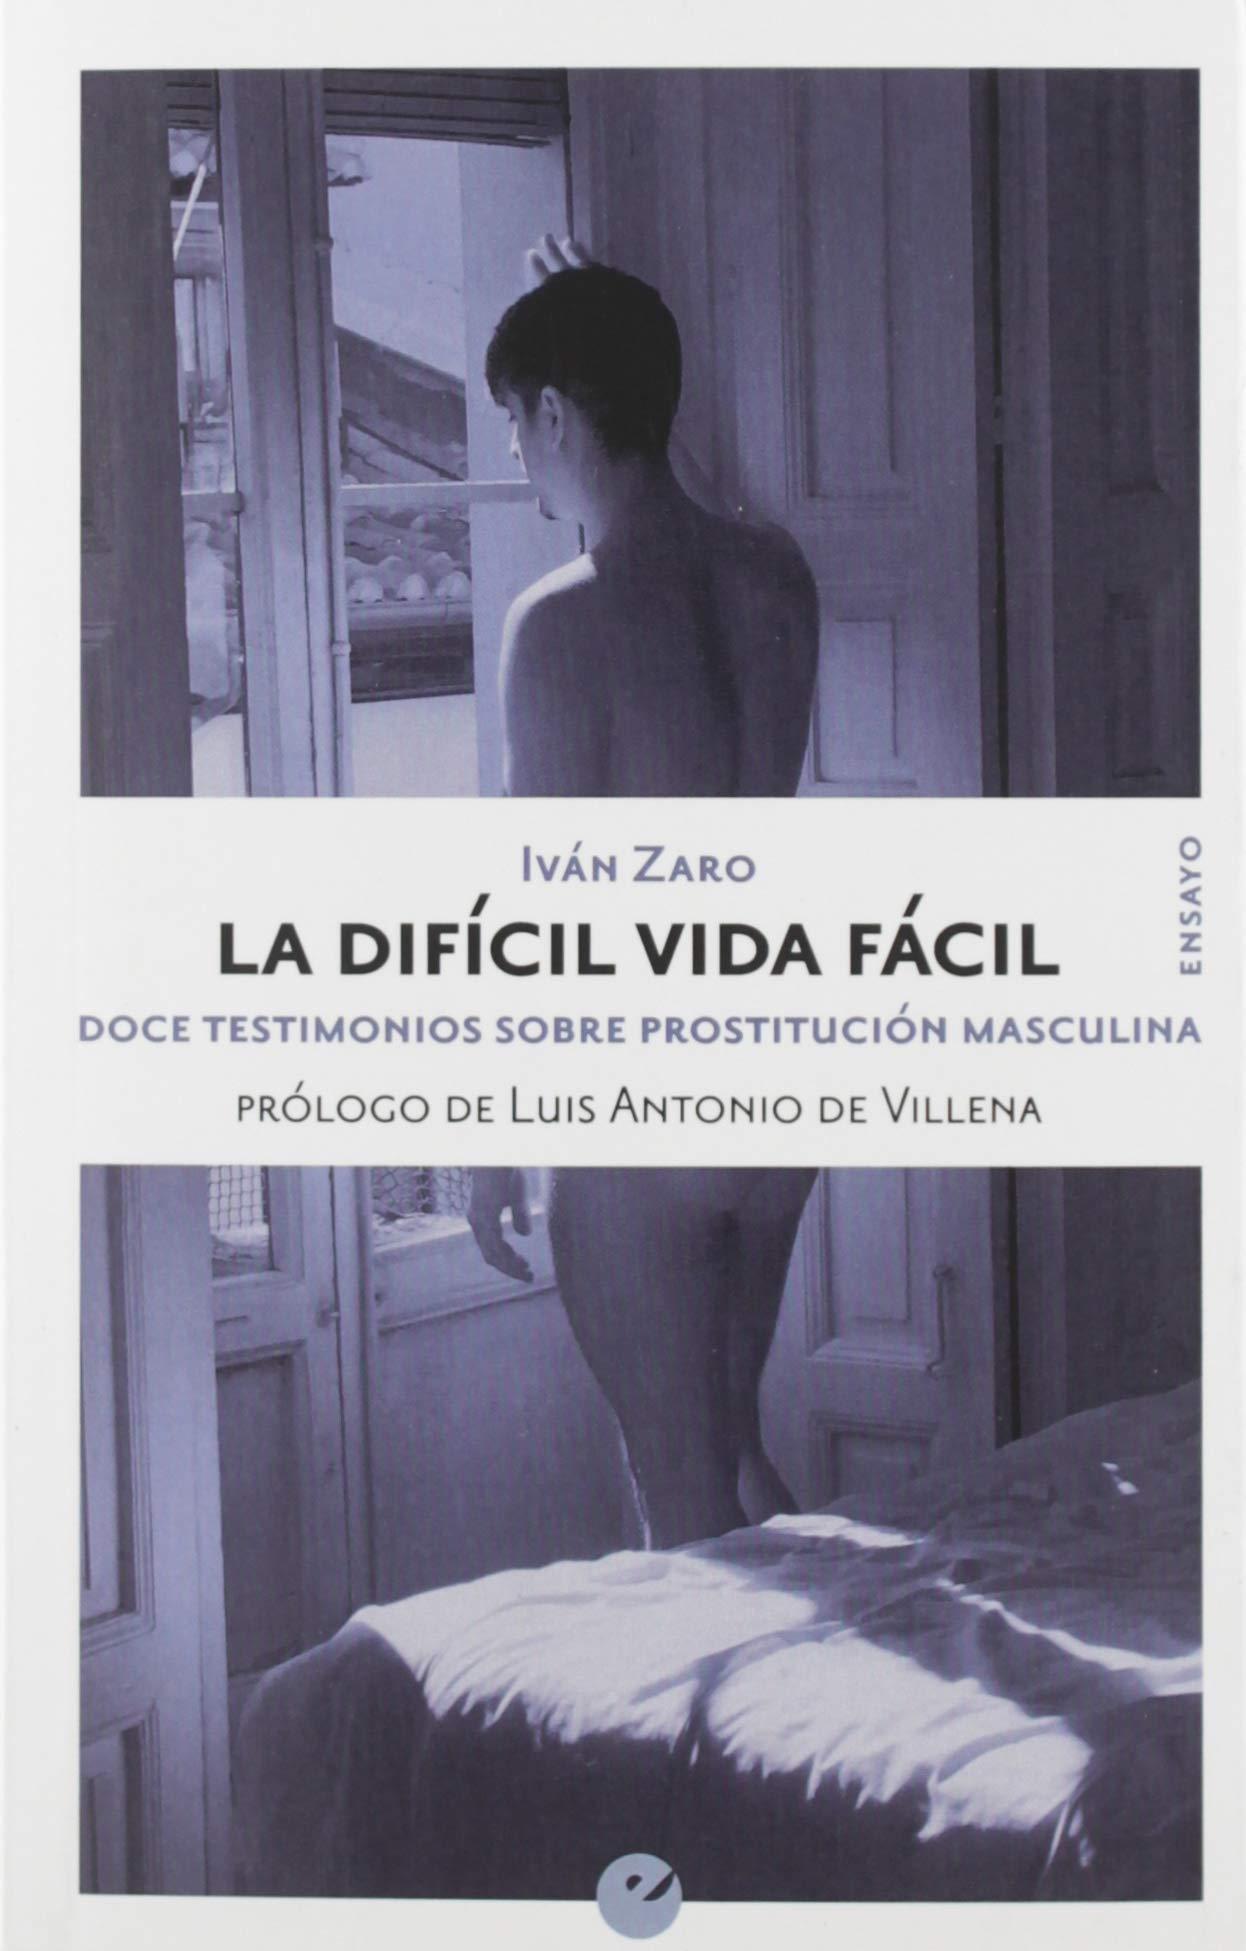 La difícil vida fácil: Doce testimonios sobre prostitución masculina: Amazon.es: Zaro, Iván: Libros